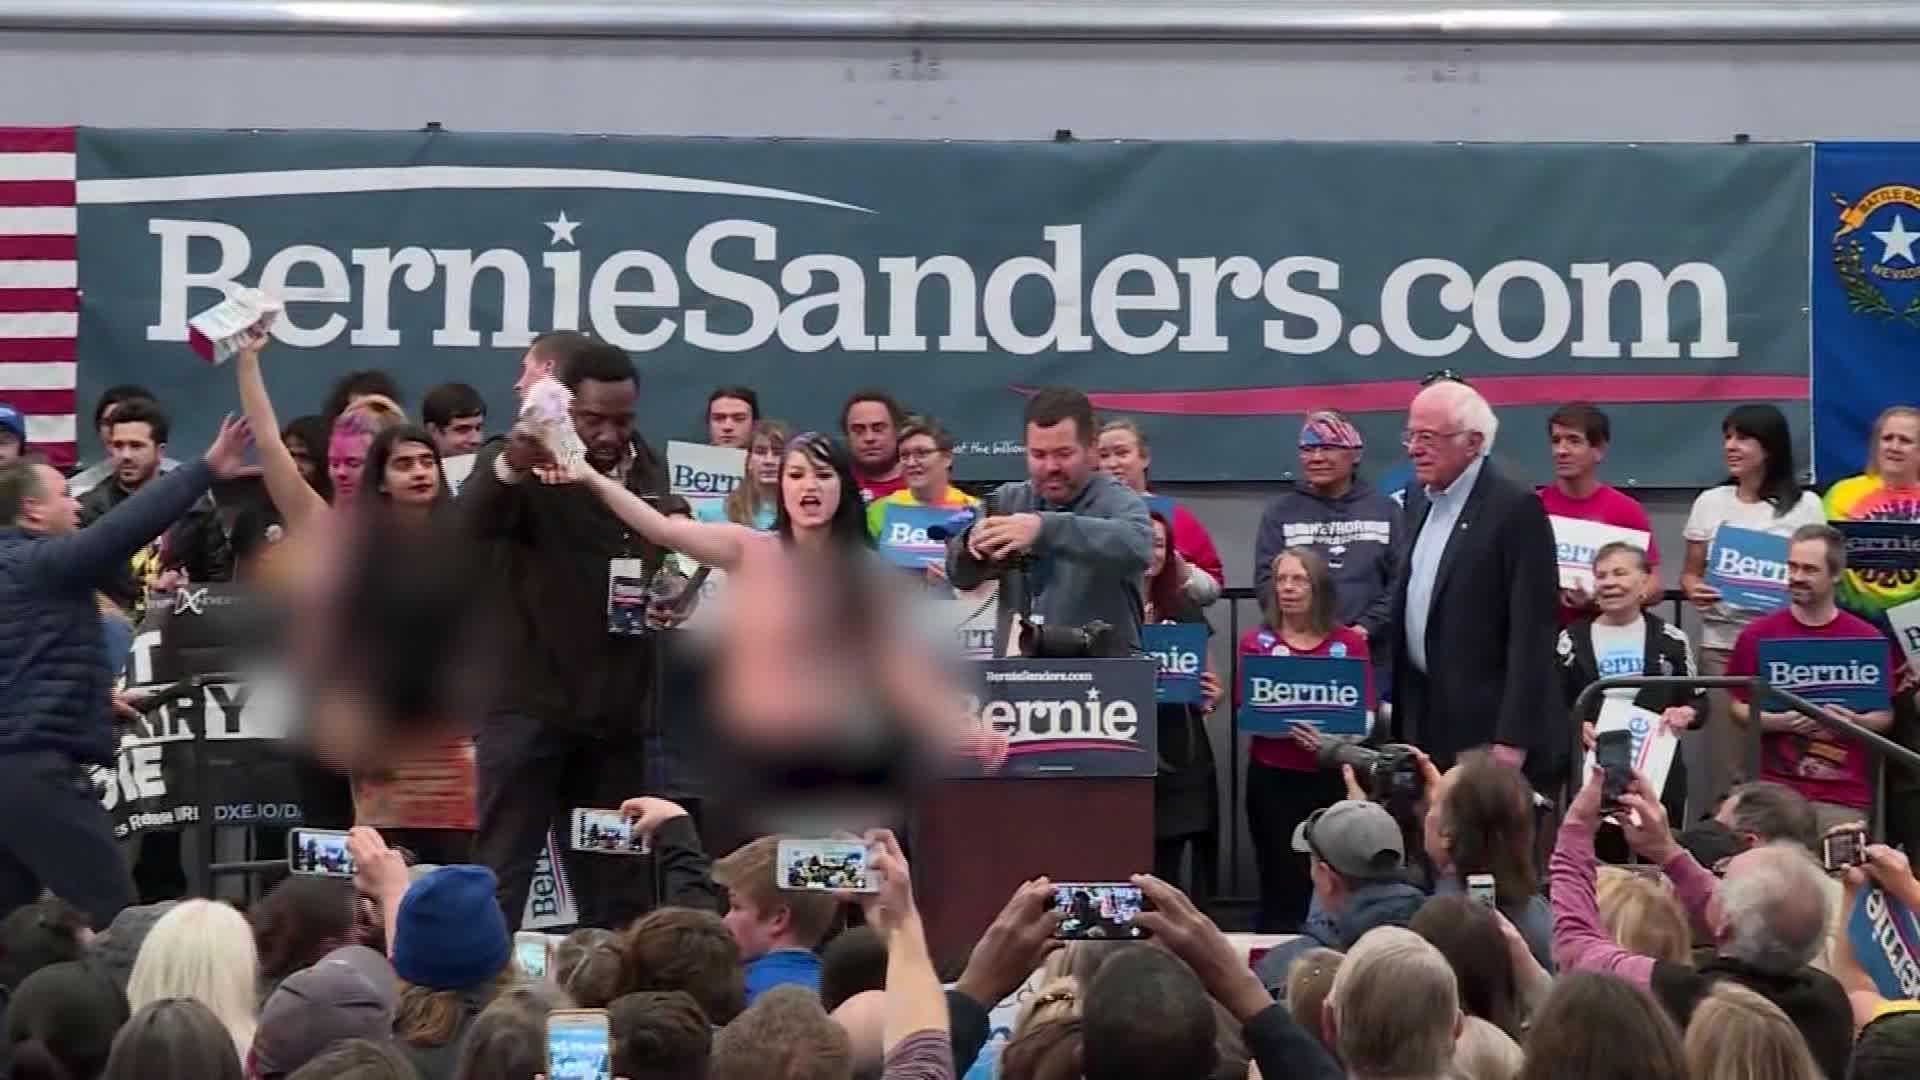 Naked girls at bernie sanders rally Topless Protesters Disrupt Bernie Sanders Rally In Nevada Cnn Video